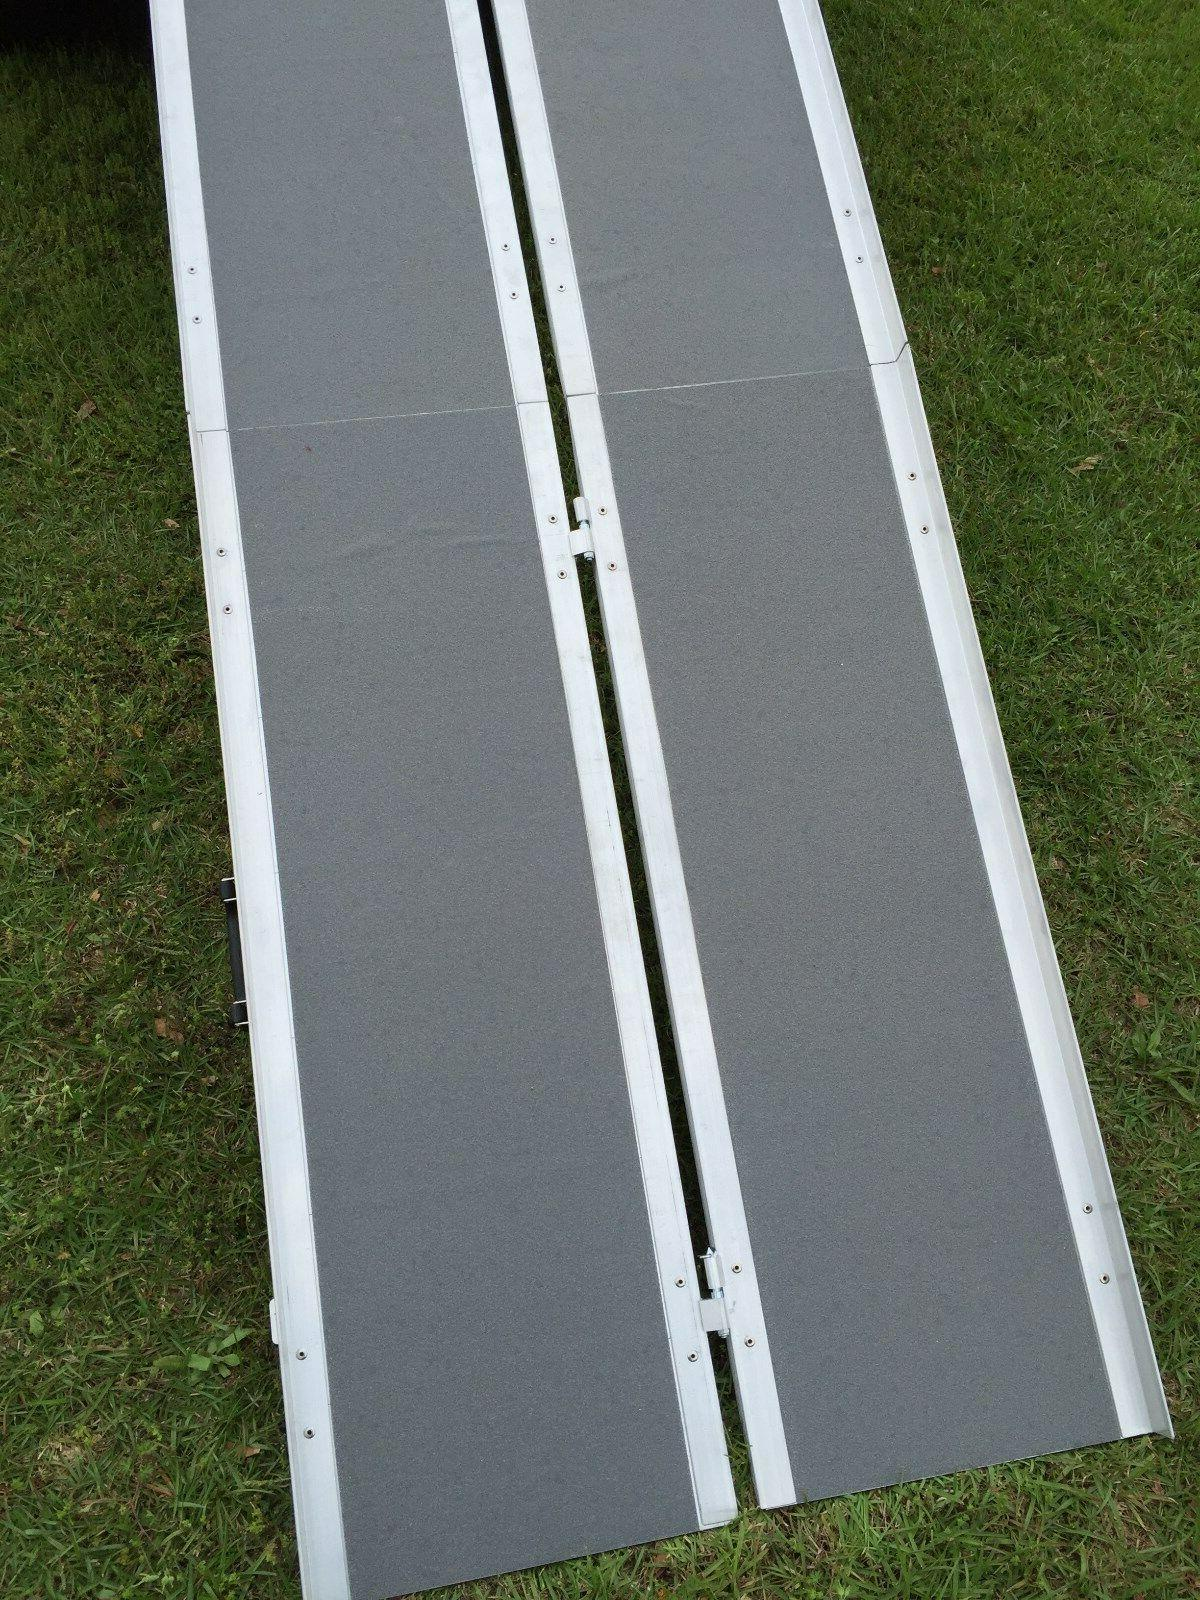 7' Grip Tape Wheelchair Portable Carrier Ramp van